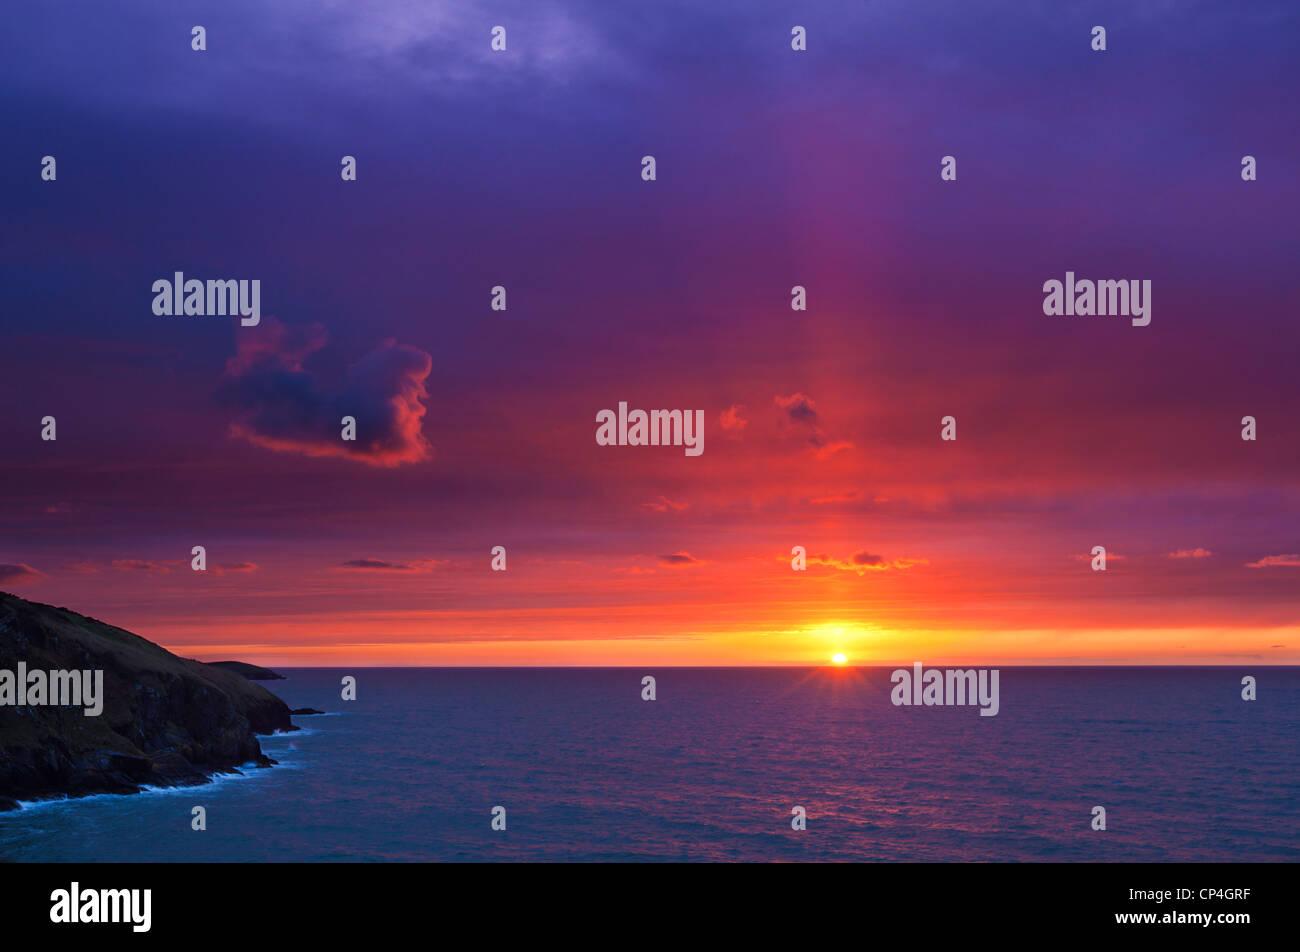 Sonnenuntergang Mwnt Cardigan Bay Ceredigion Küste Cardiganshire Wales Großbritannien GB EU Europa Stockbild